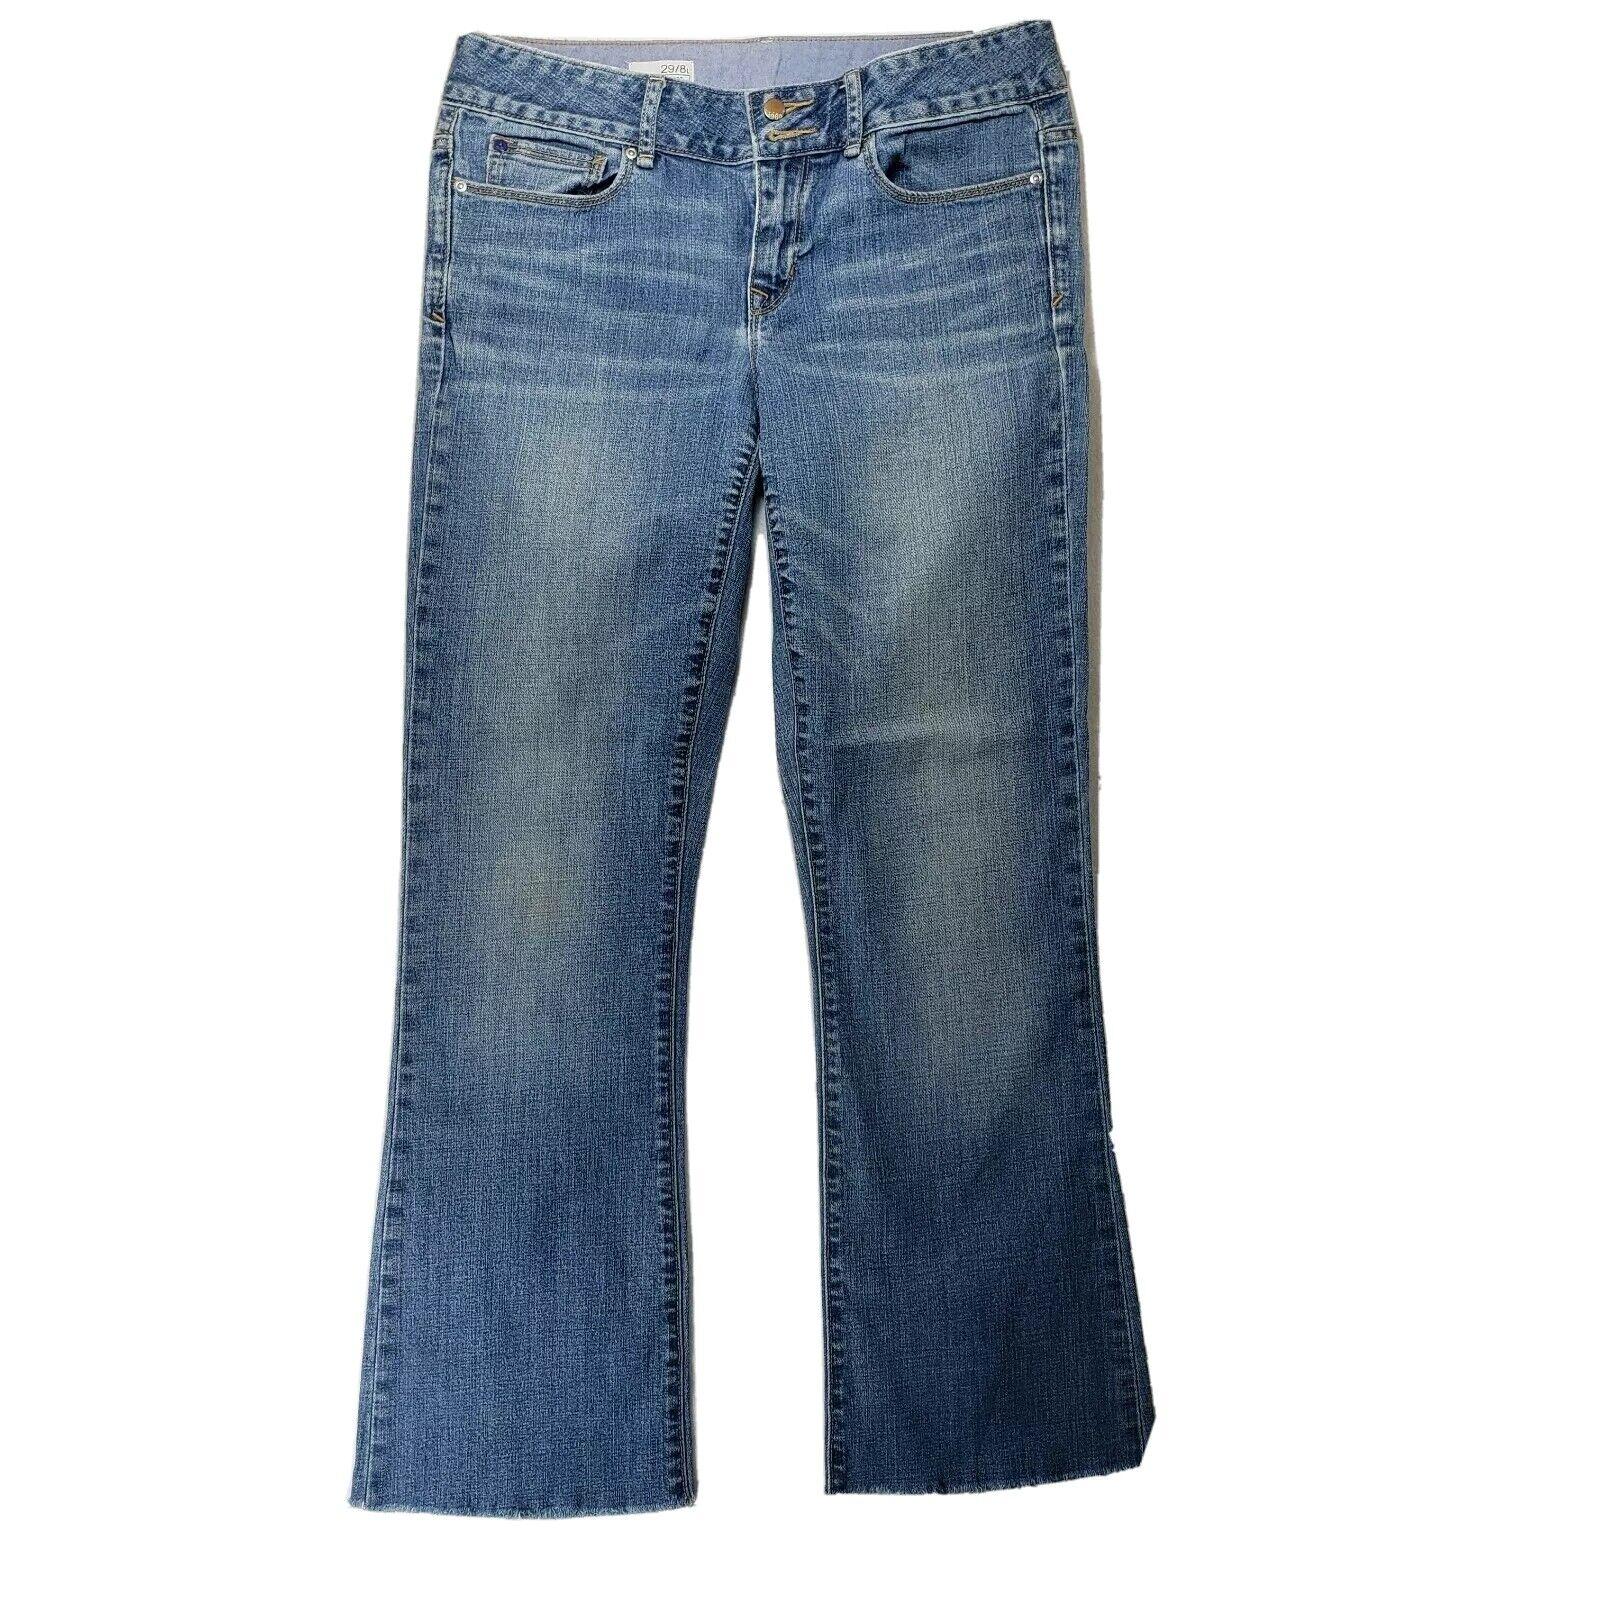 Perfect boot cut size 29L gap